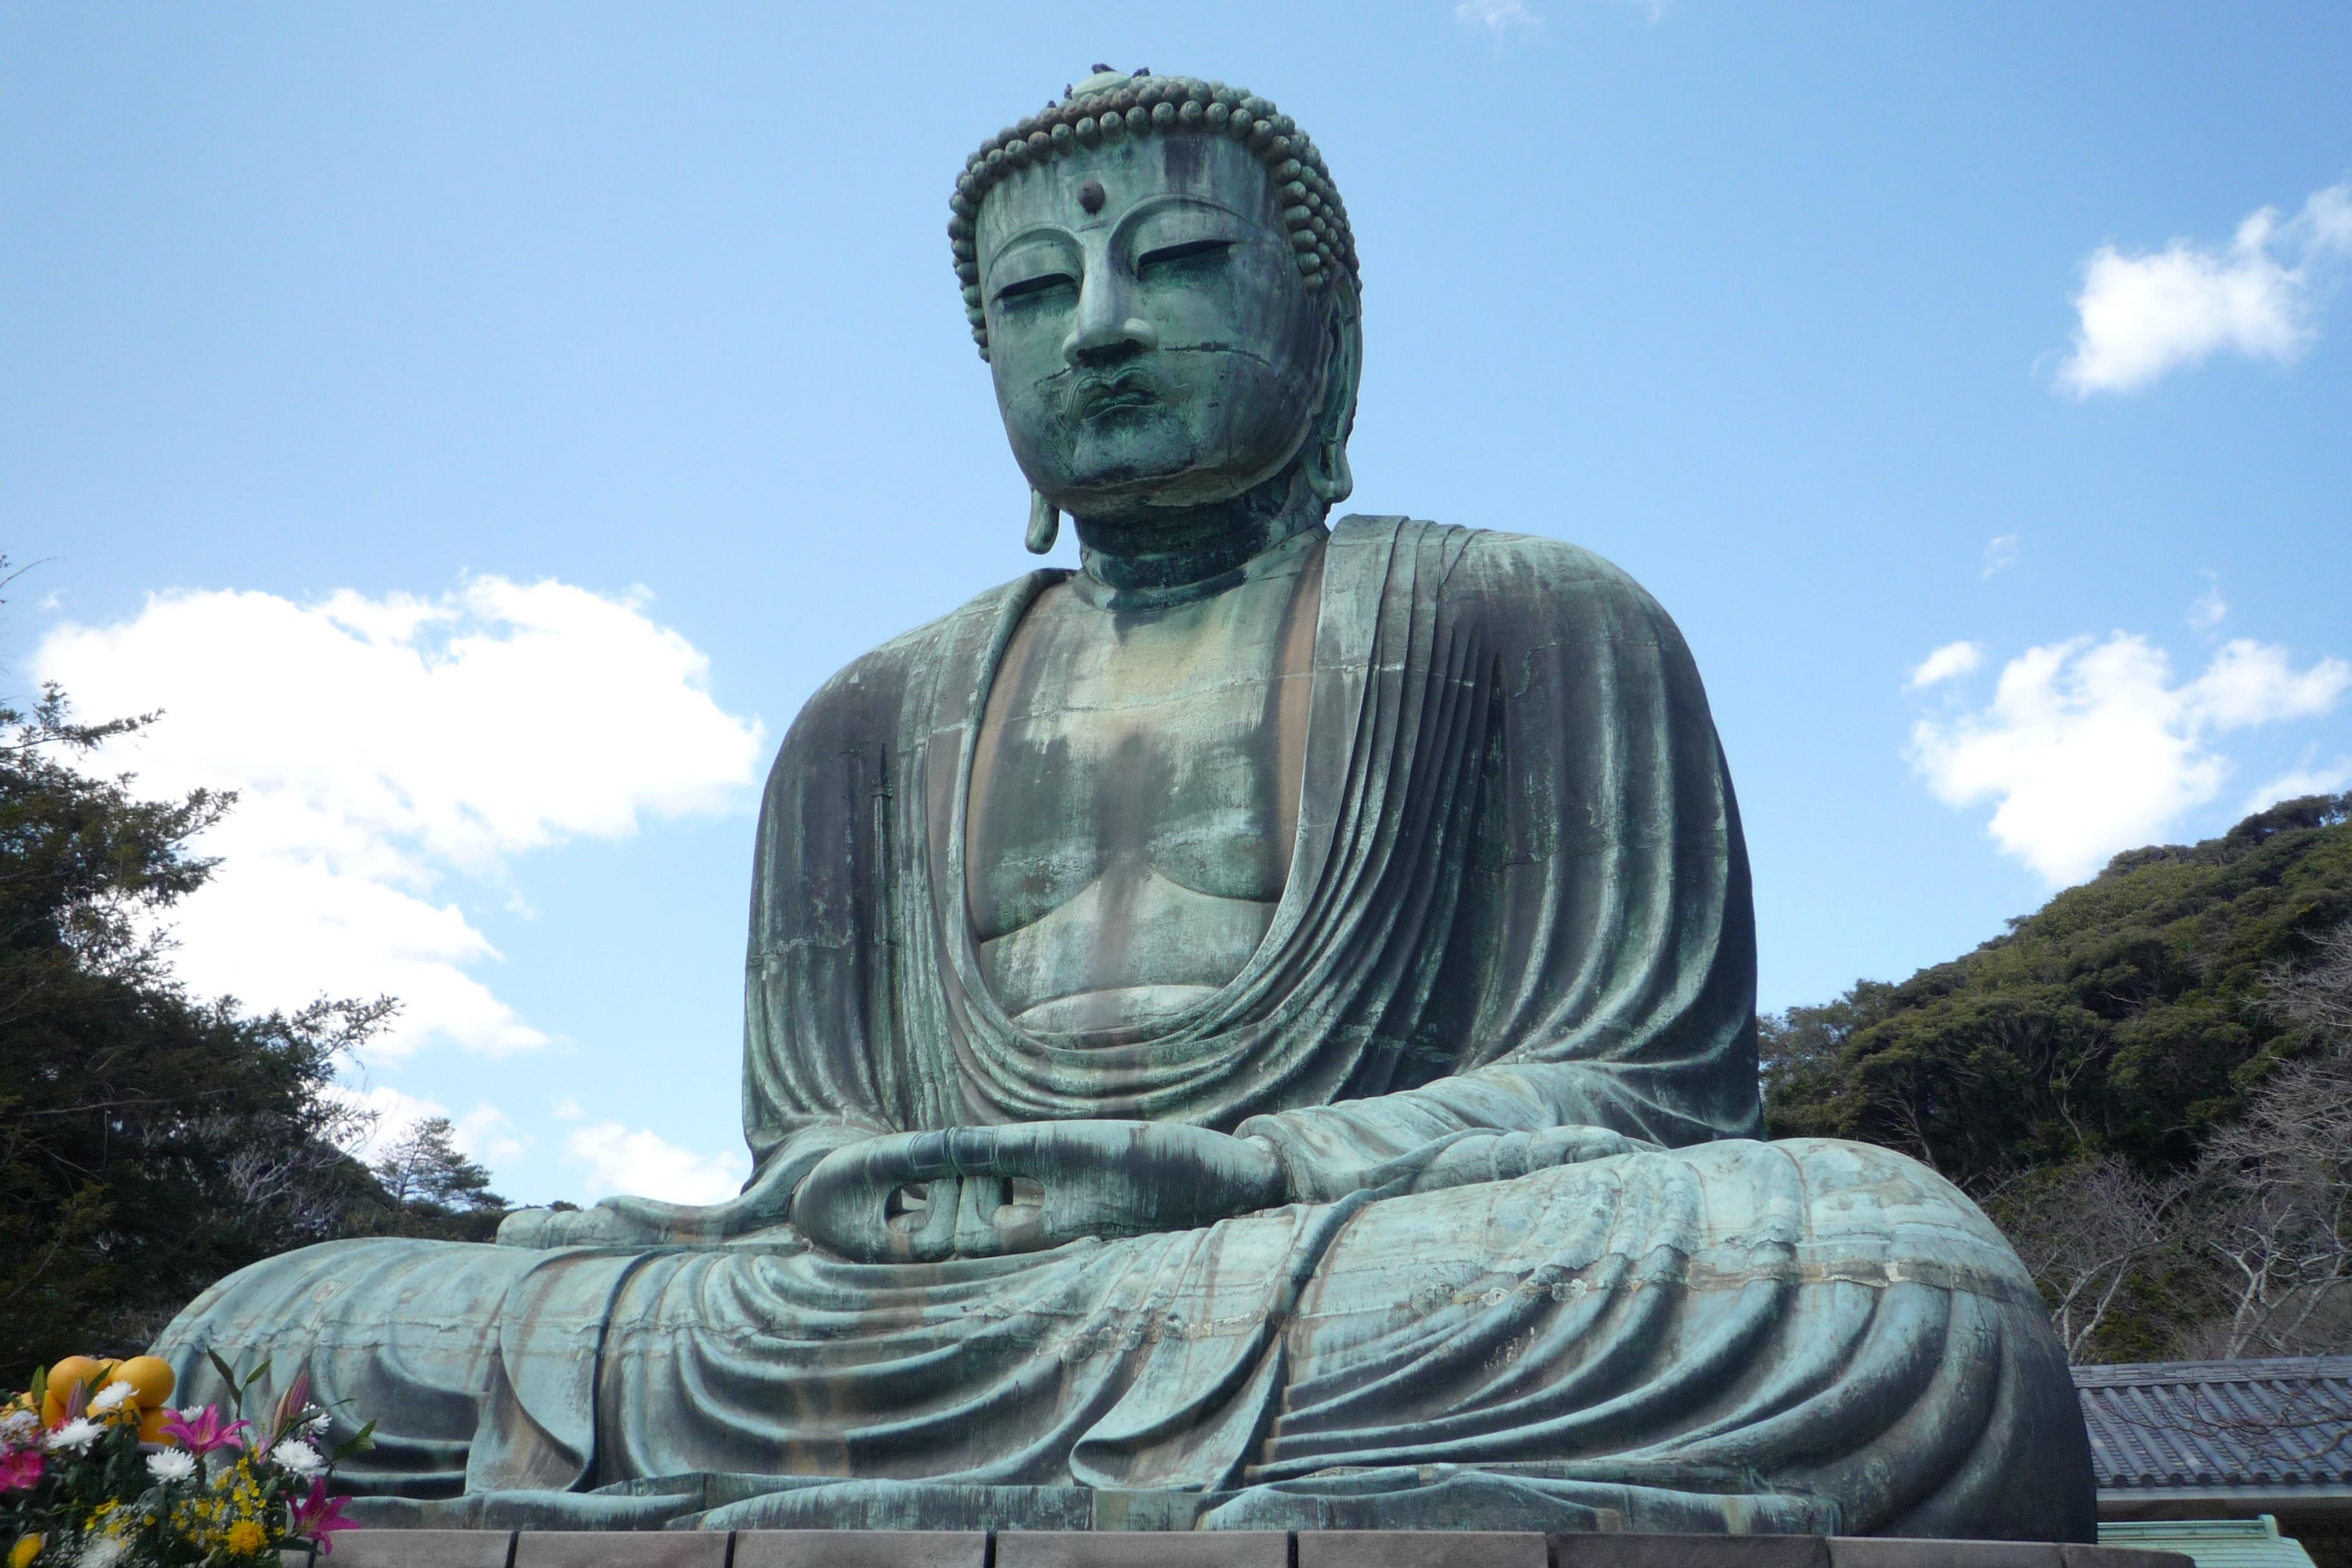 Fotos gratis Monumento estatua budista budismo religin Asia